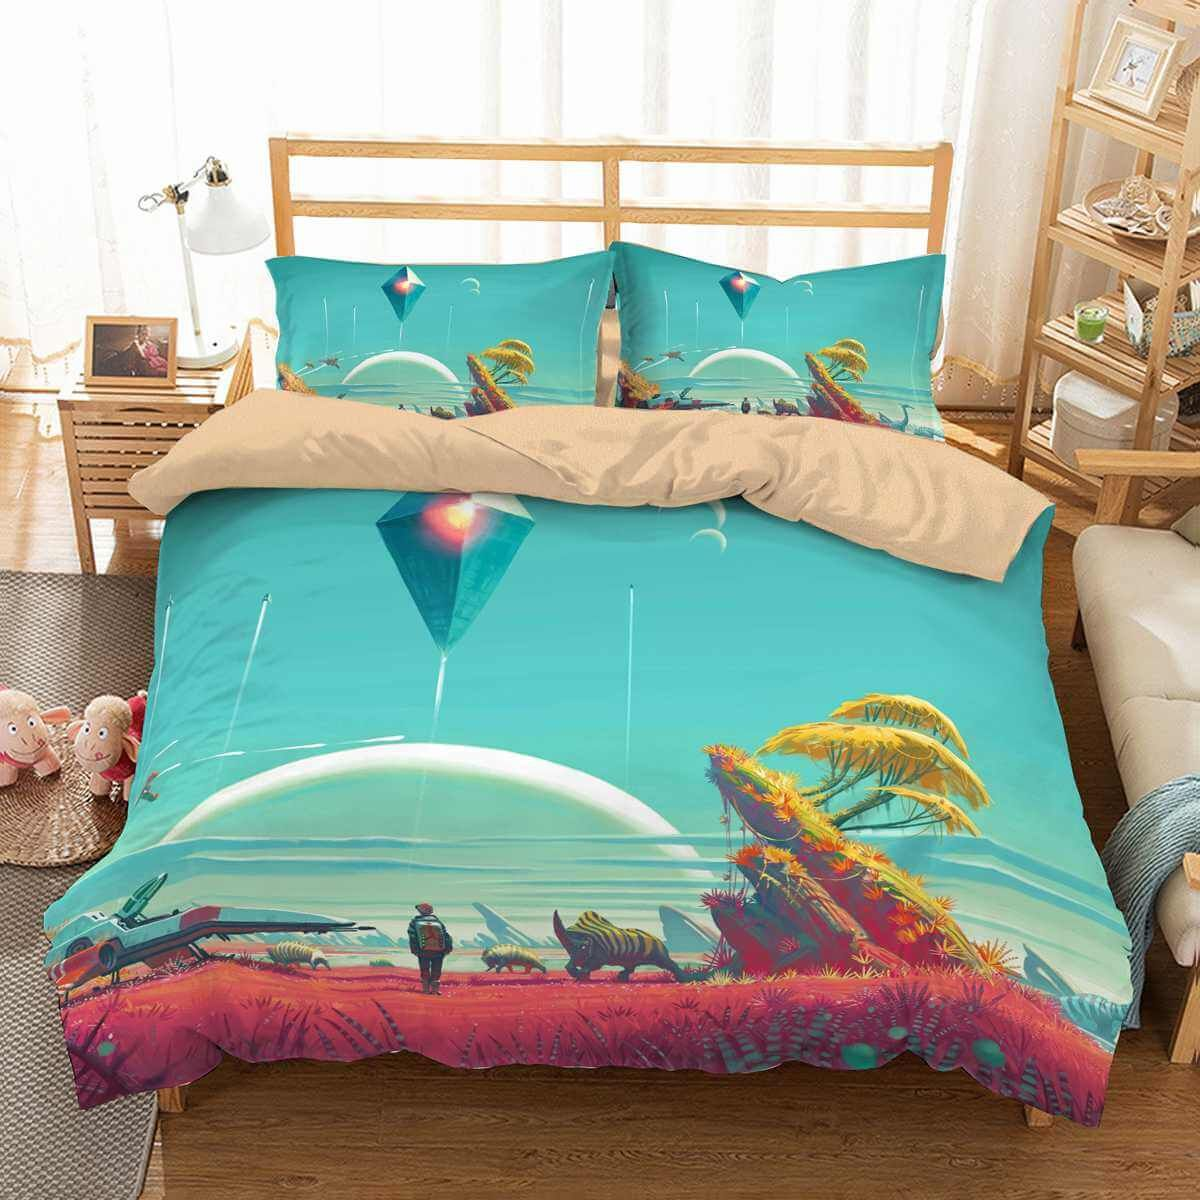 3d Customize No Man S Sky Bedding Set Duvet Cover Set Bedroom Set